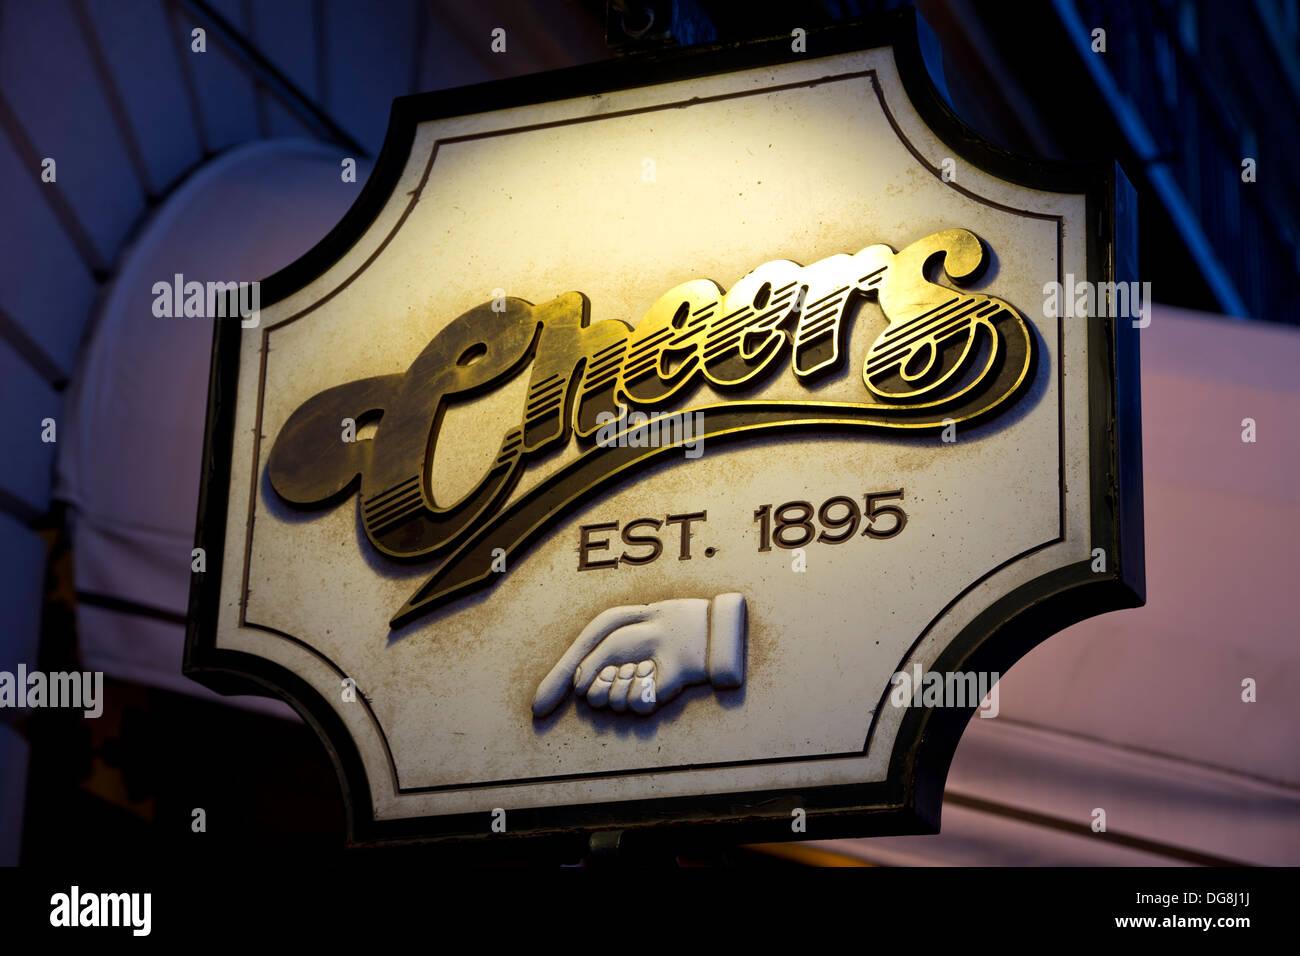 'Cheers' bar sign, Boston, Massachusetts USA - Stock Image